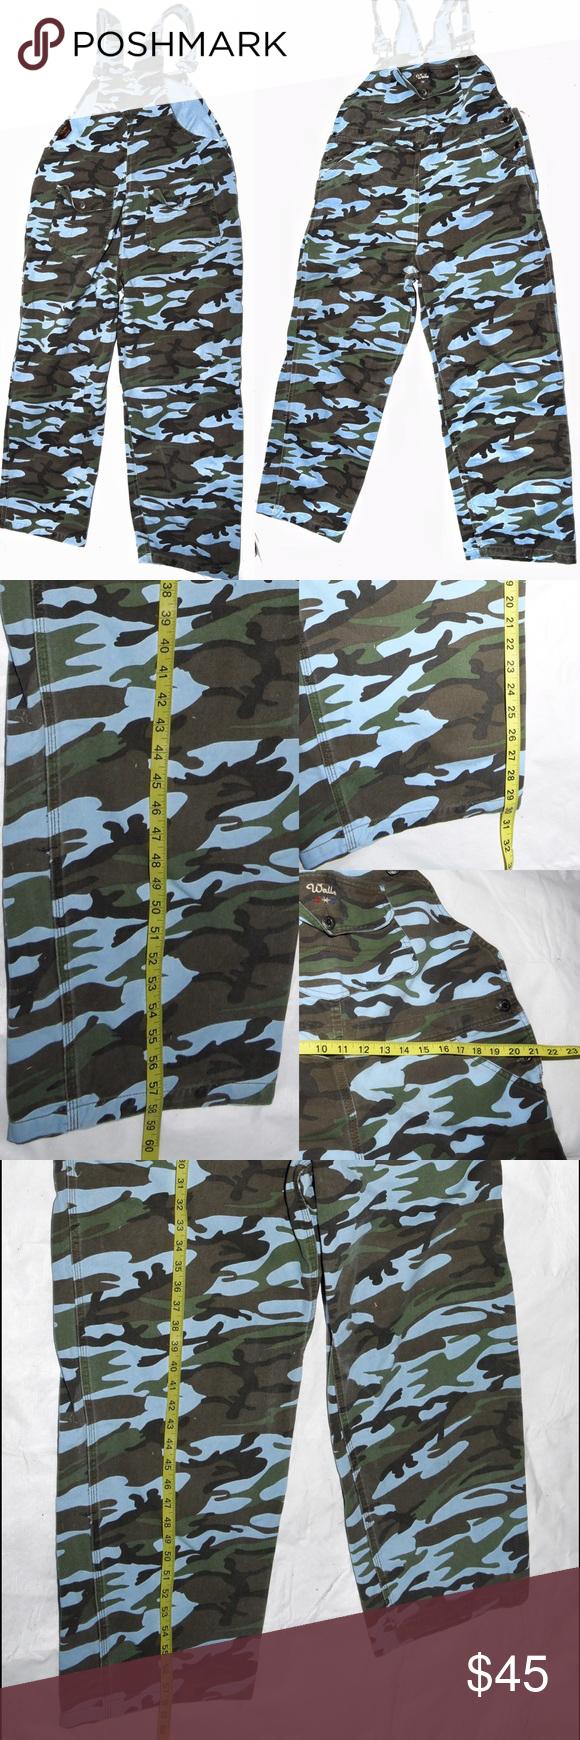 walls ranchwear denim bib overall blue camo xl blue camo on walls hunting coveralls id=23405